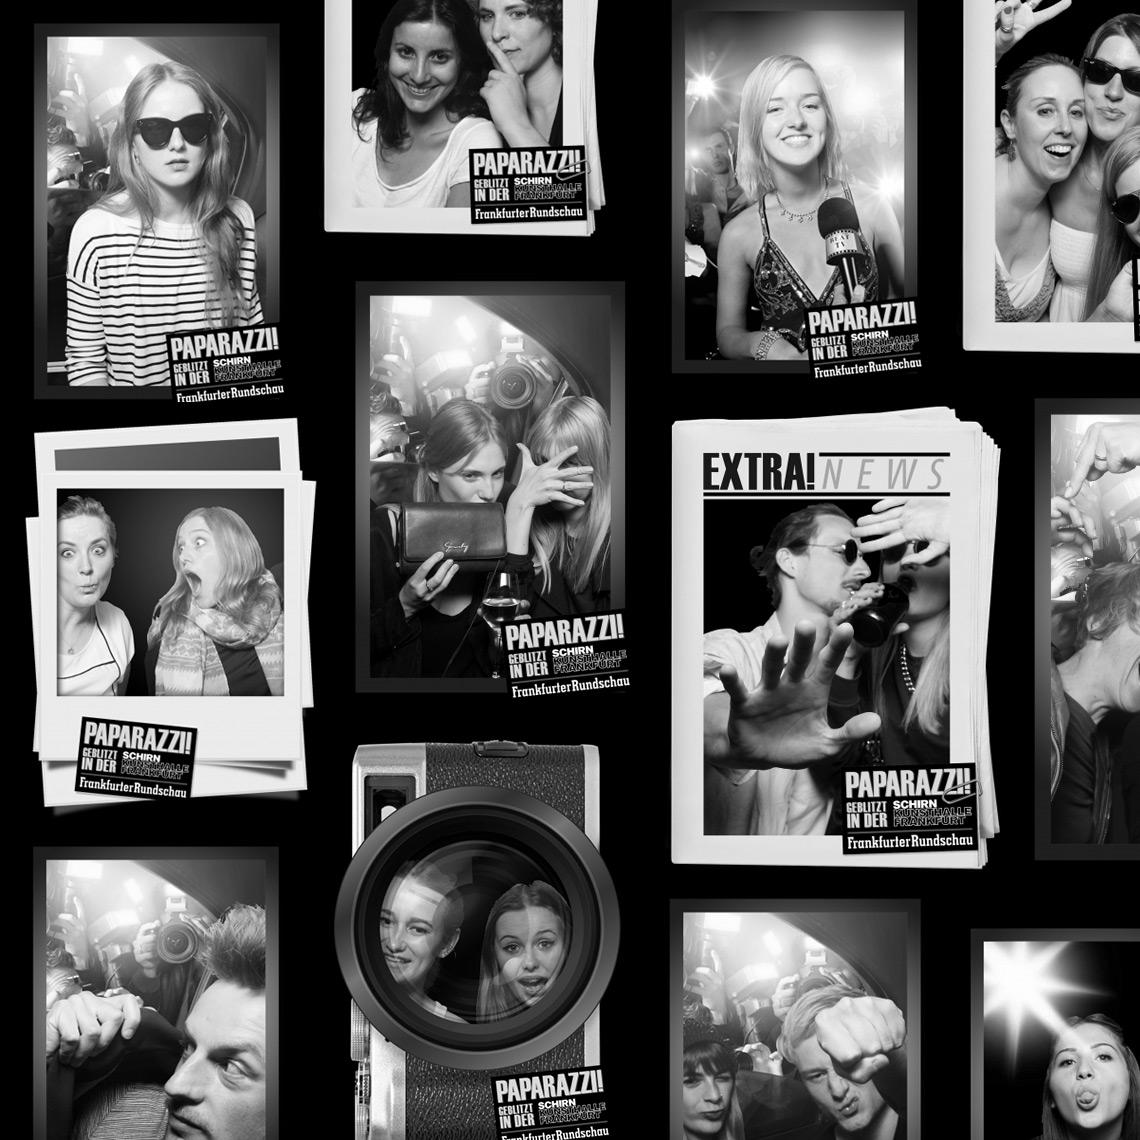 ENVY Project - Paparazzi! - Image 4